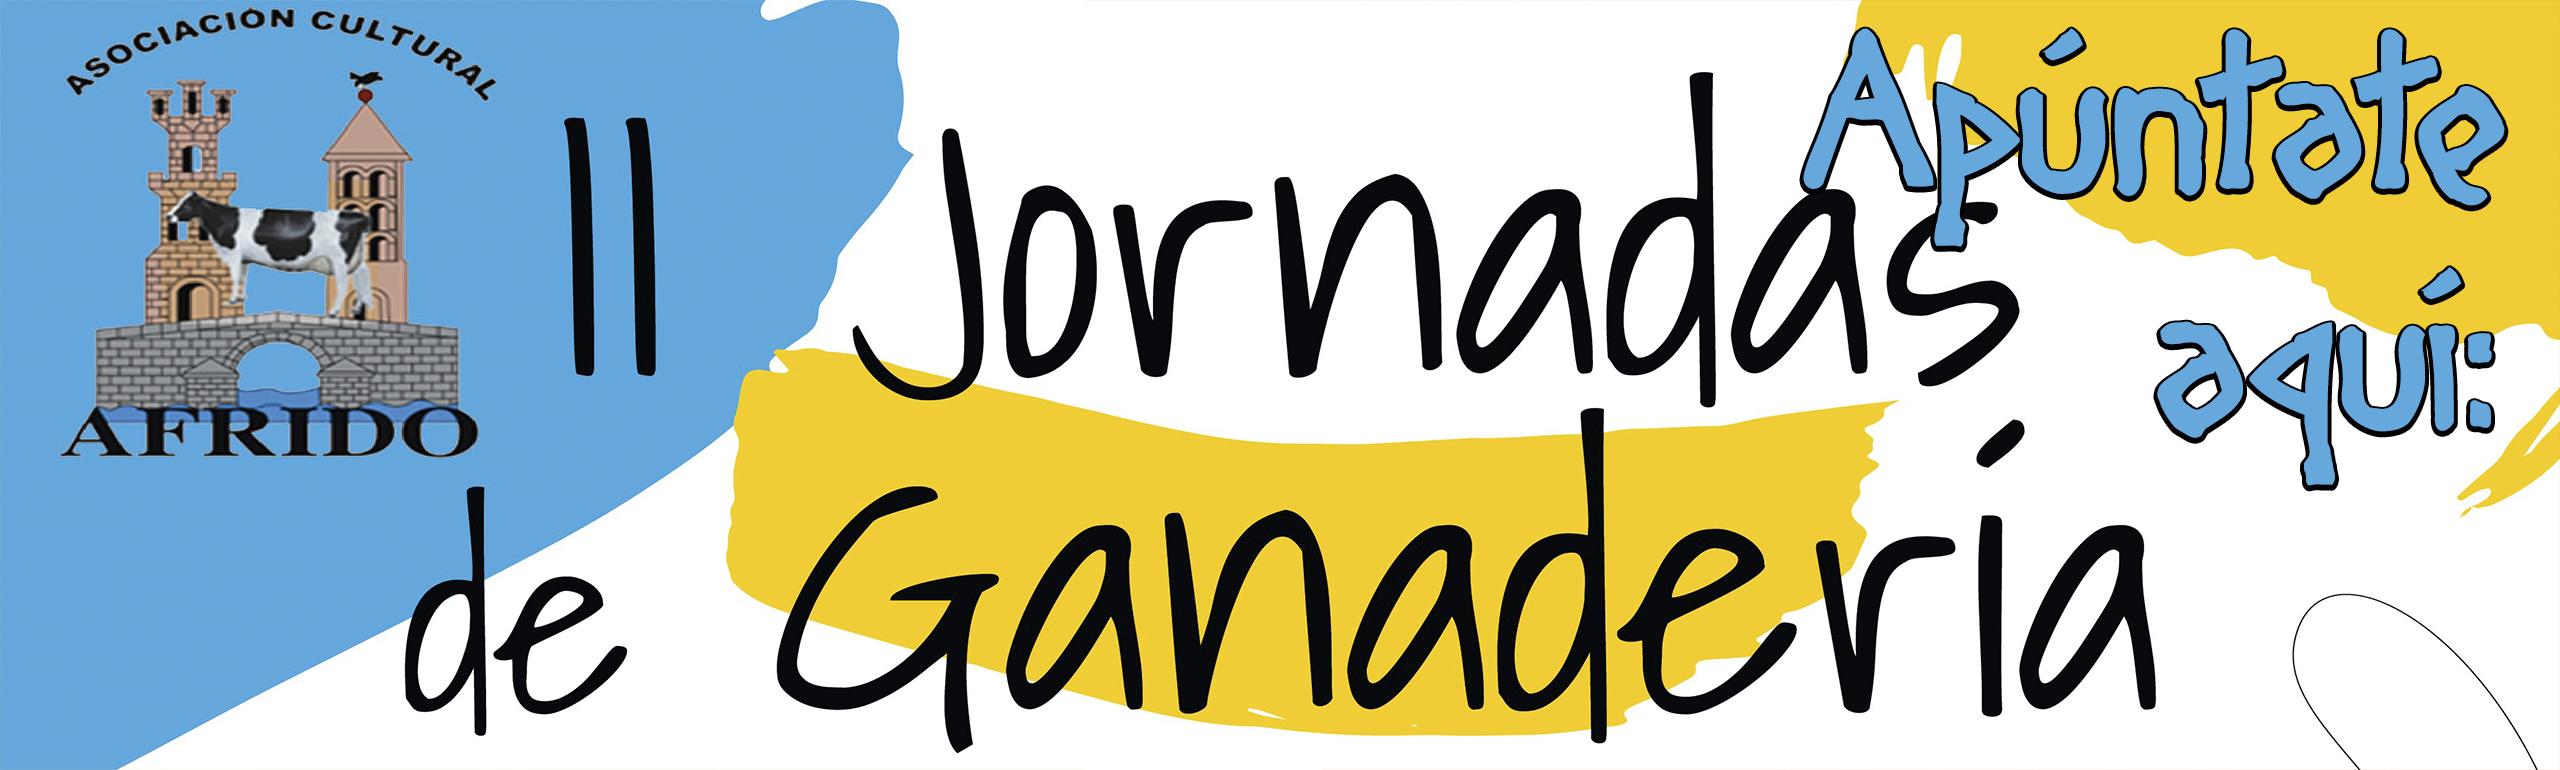 BANNER JORNADAS DE GANADERIA INFANTIL